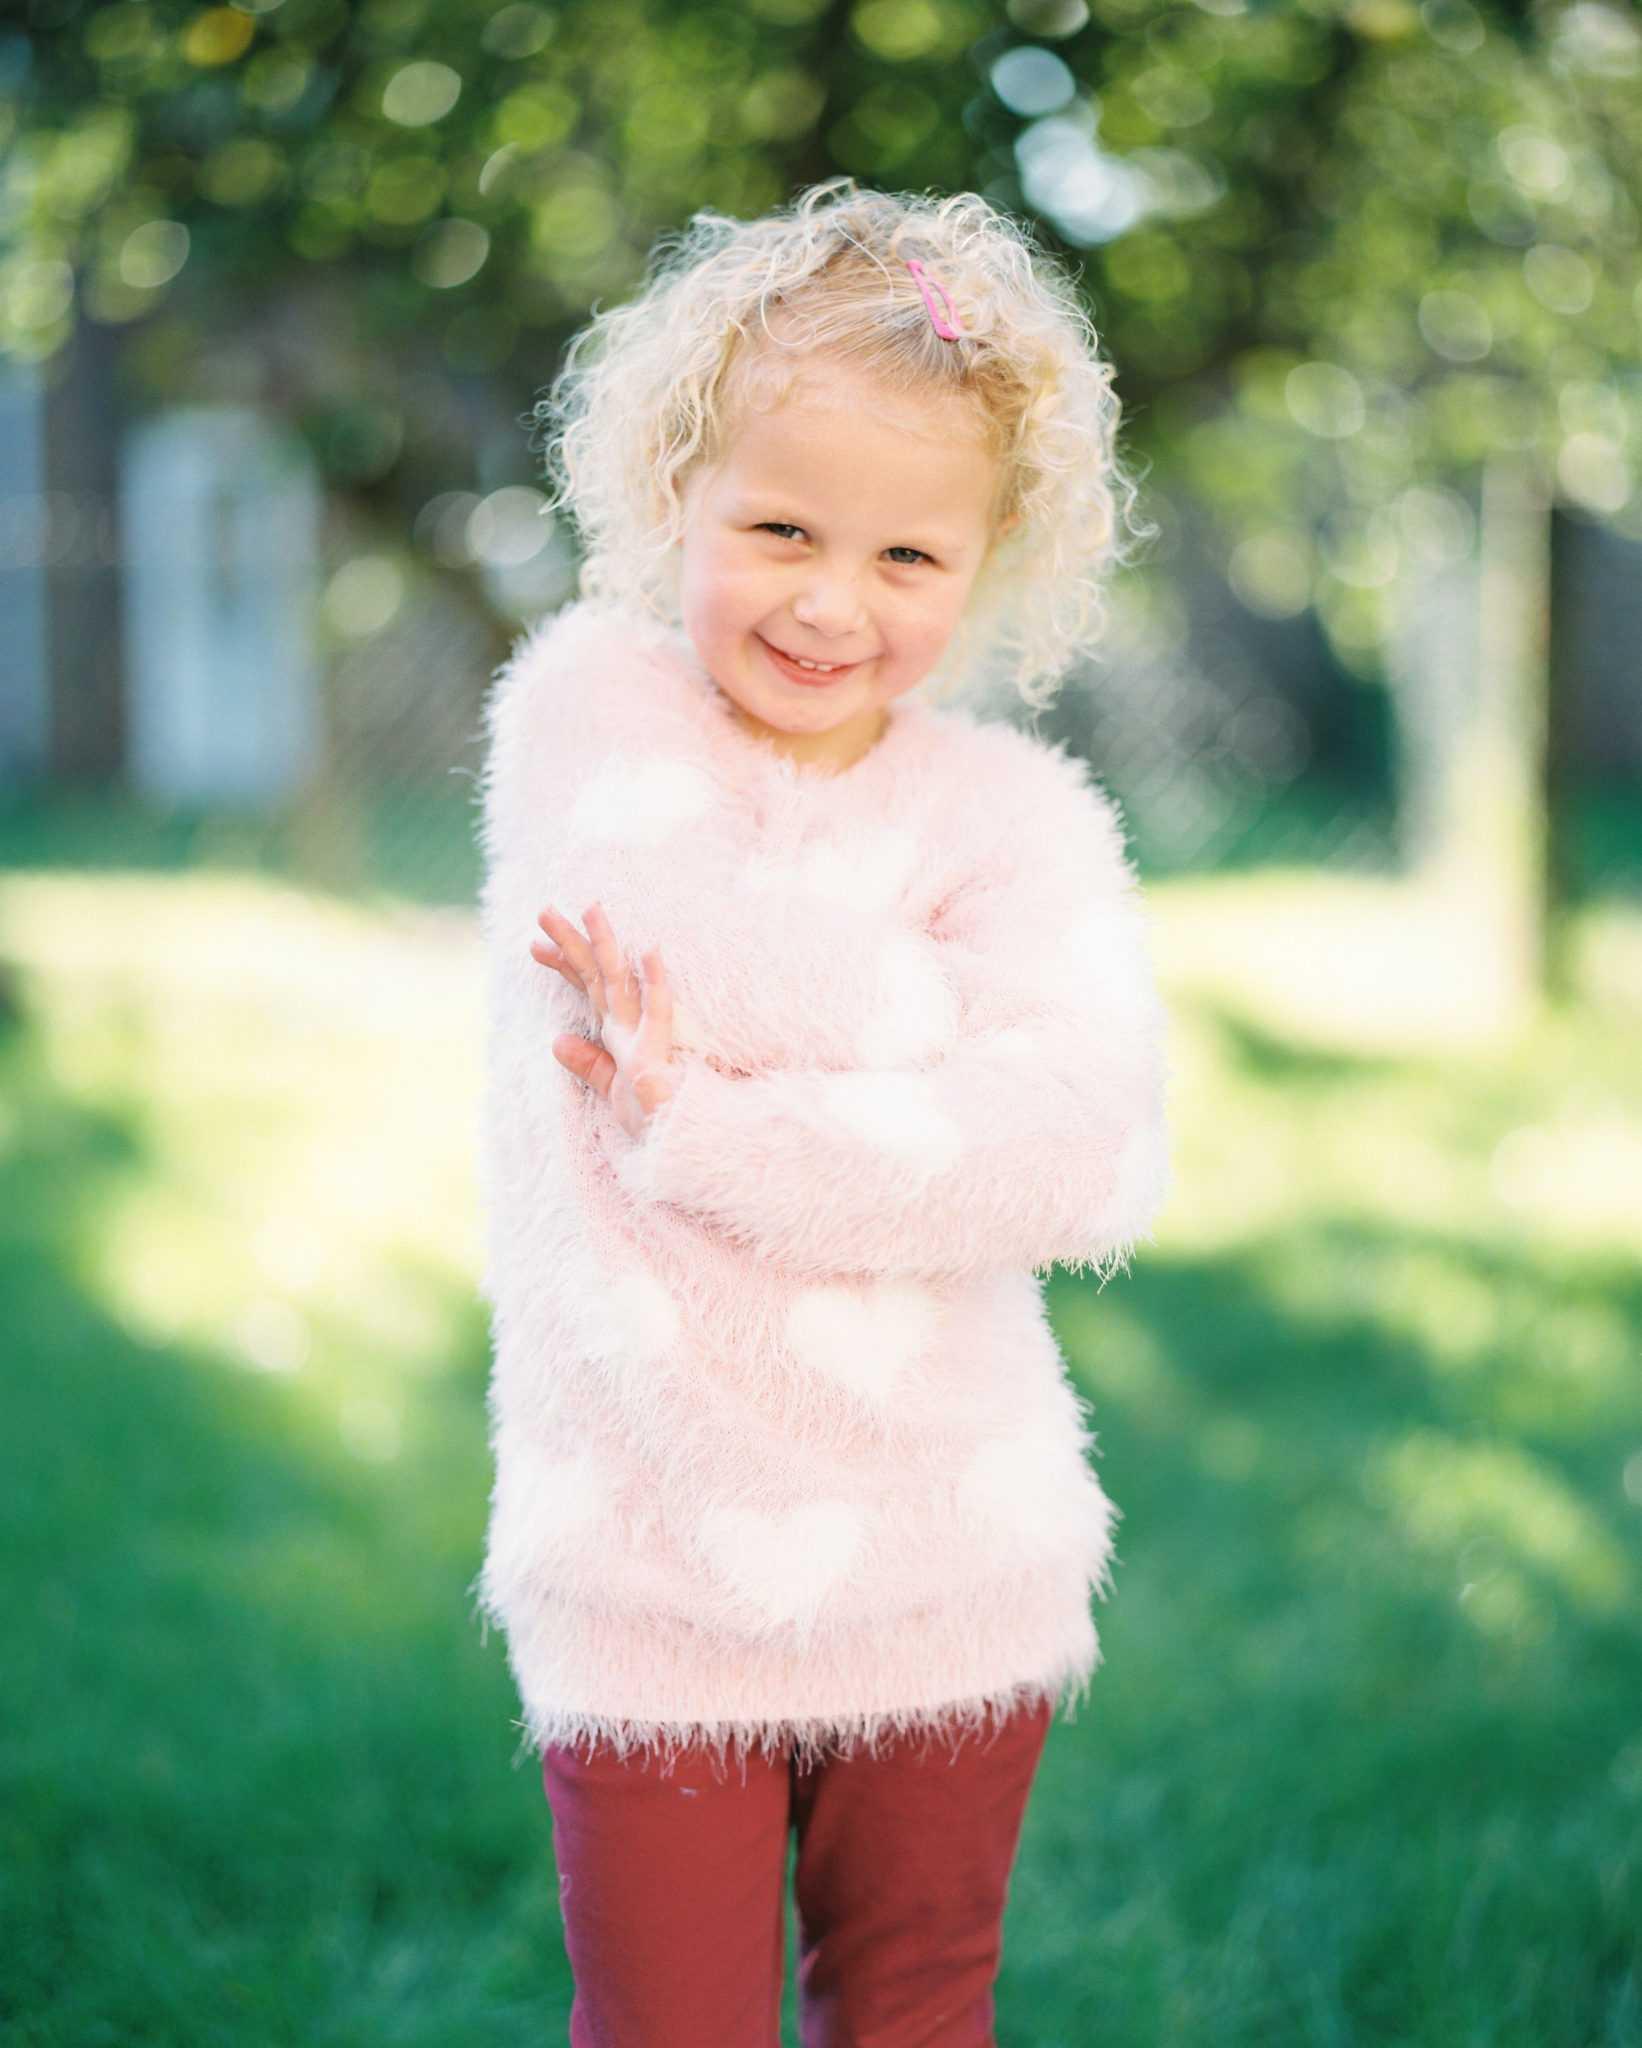 Child Photography Stockport